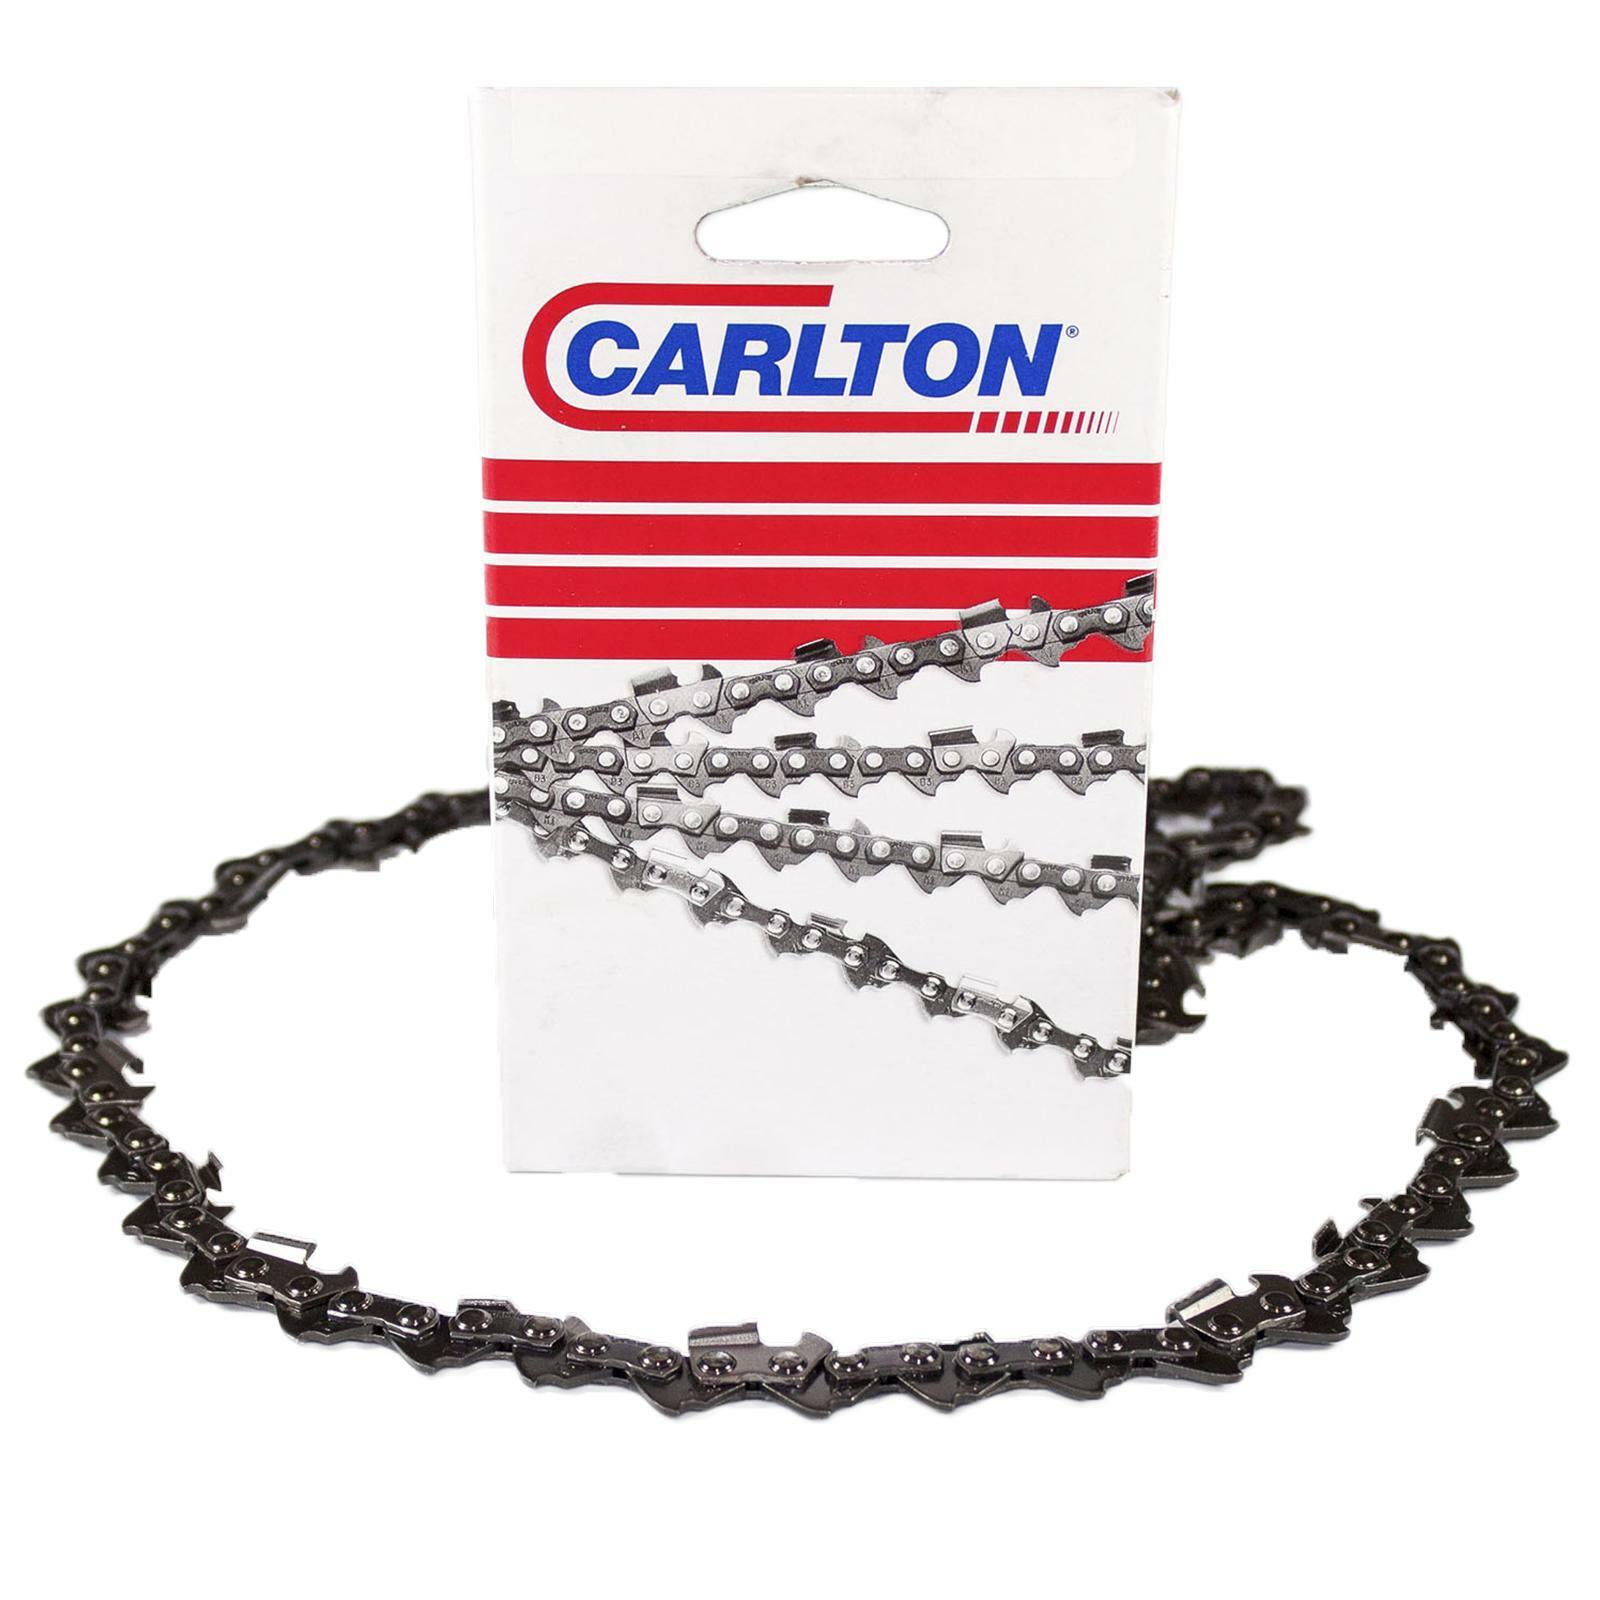 carlton catena per motosega carlton 3/8 sp 1.3 cm 40 57 maglie